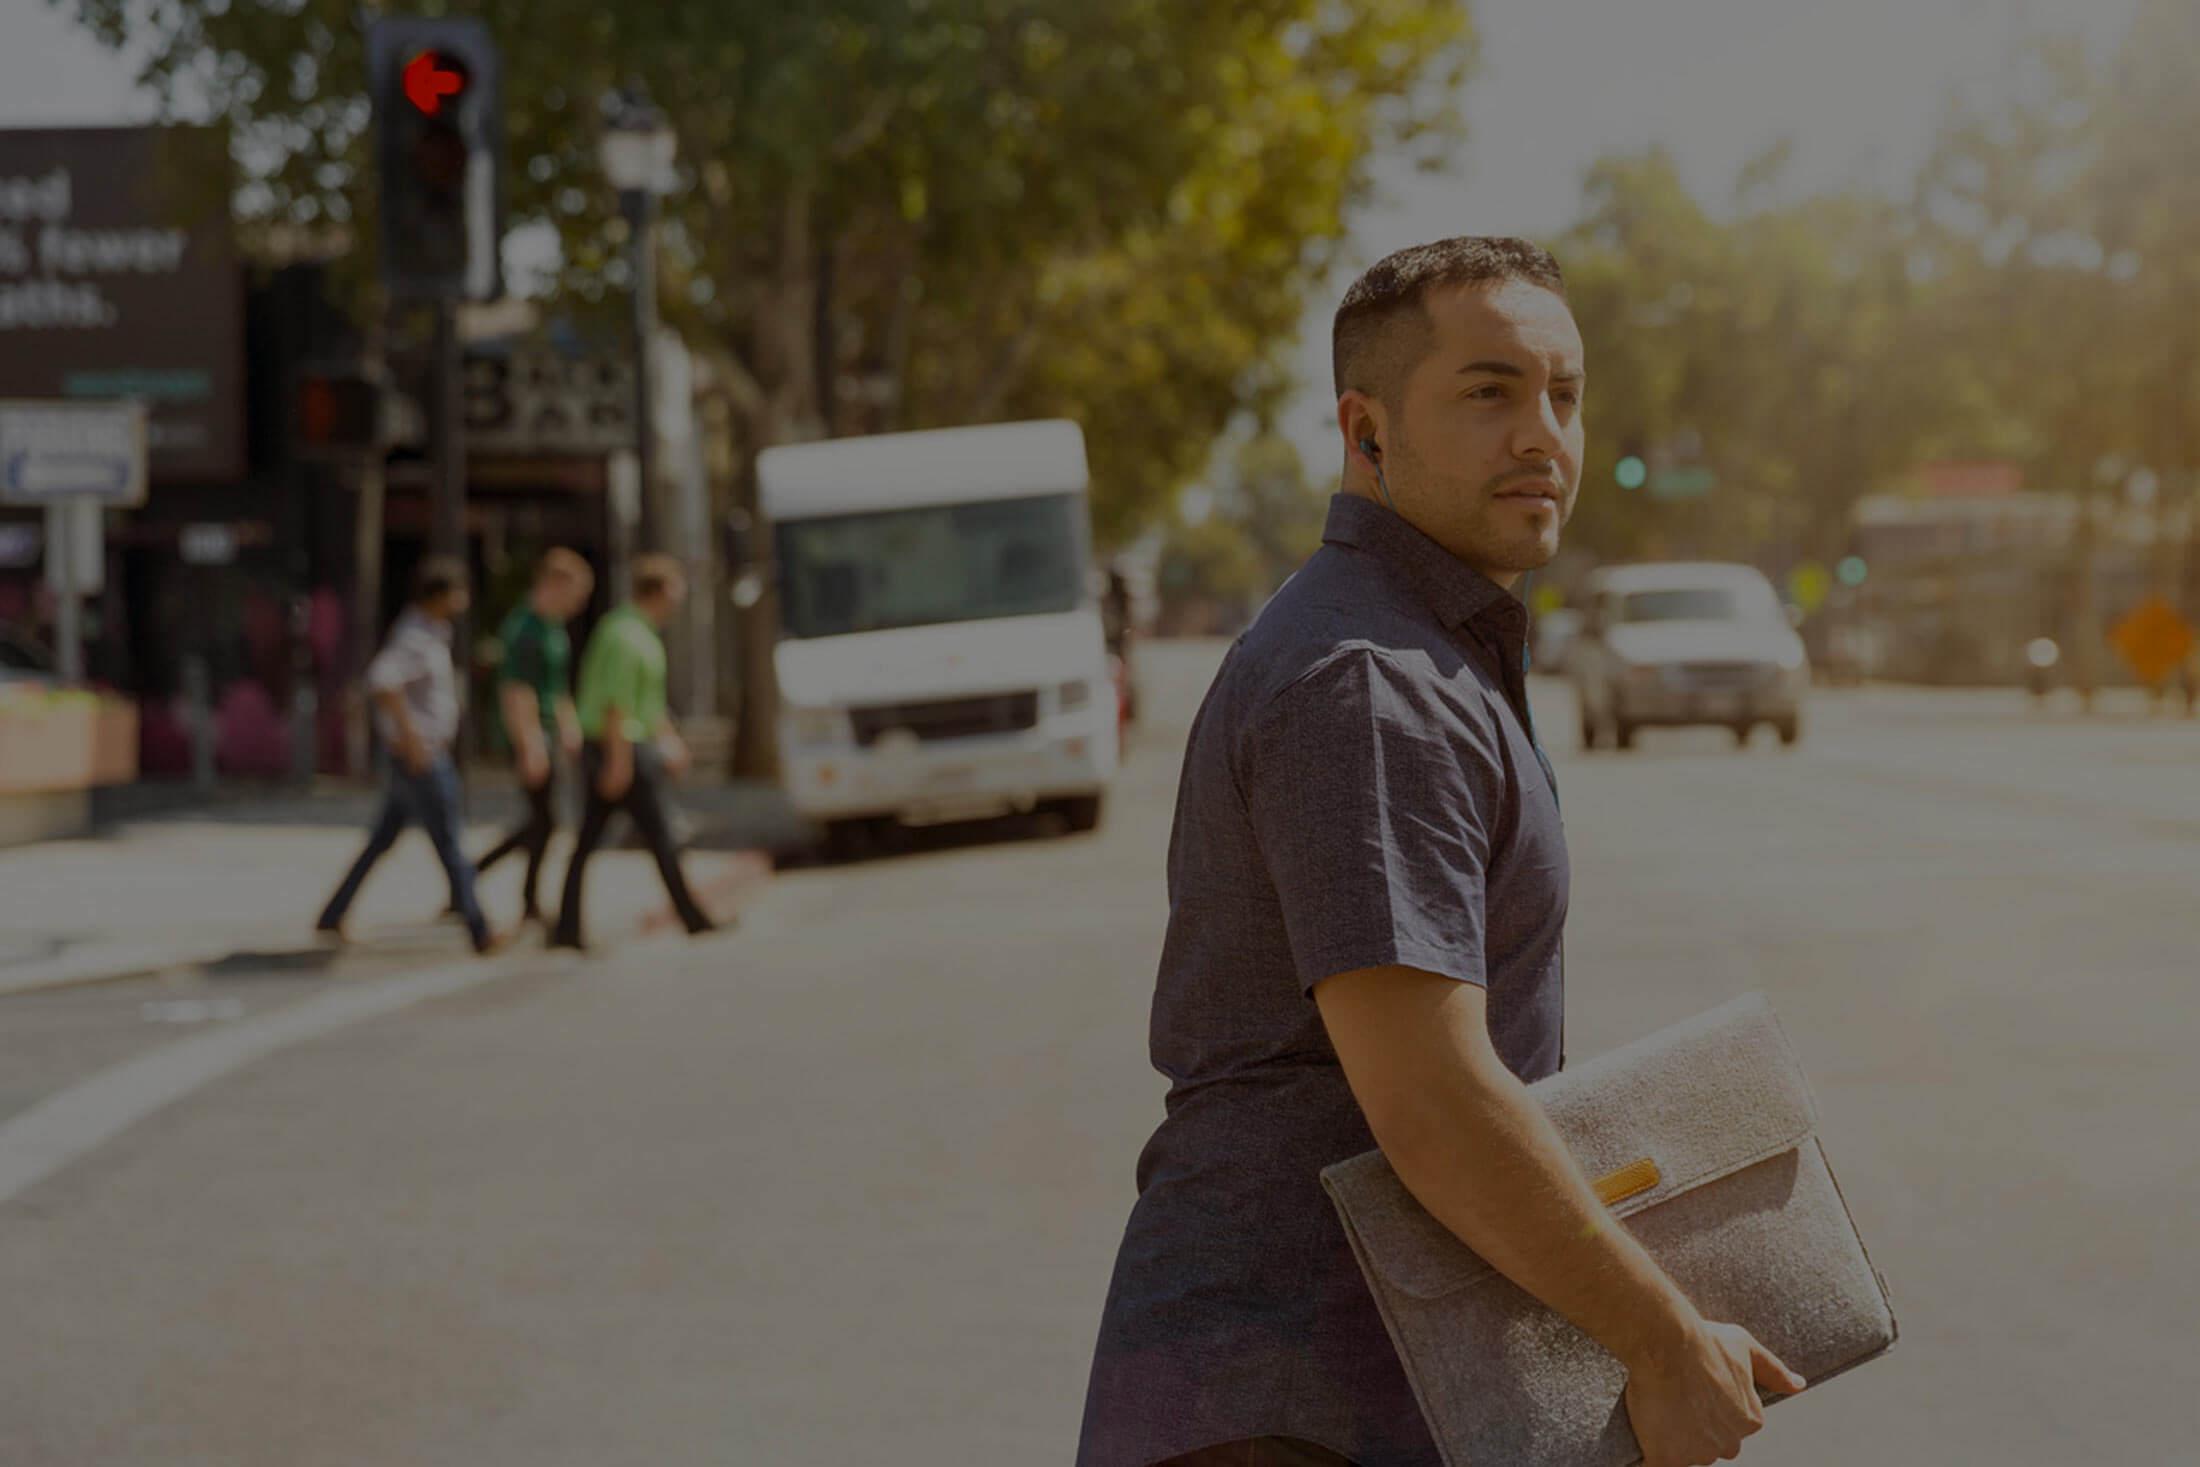 Pole emploi - offre emploi Technicien de bureau d'étude (H/F) - Alençon